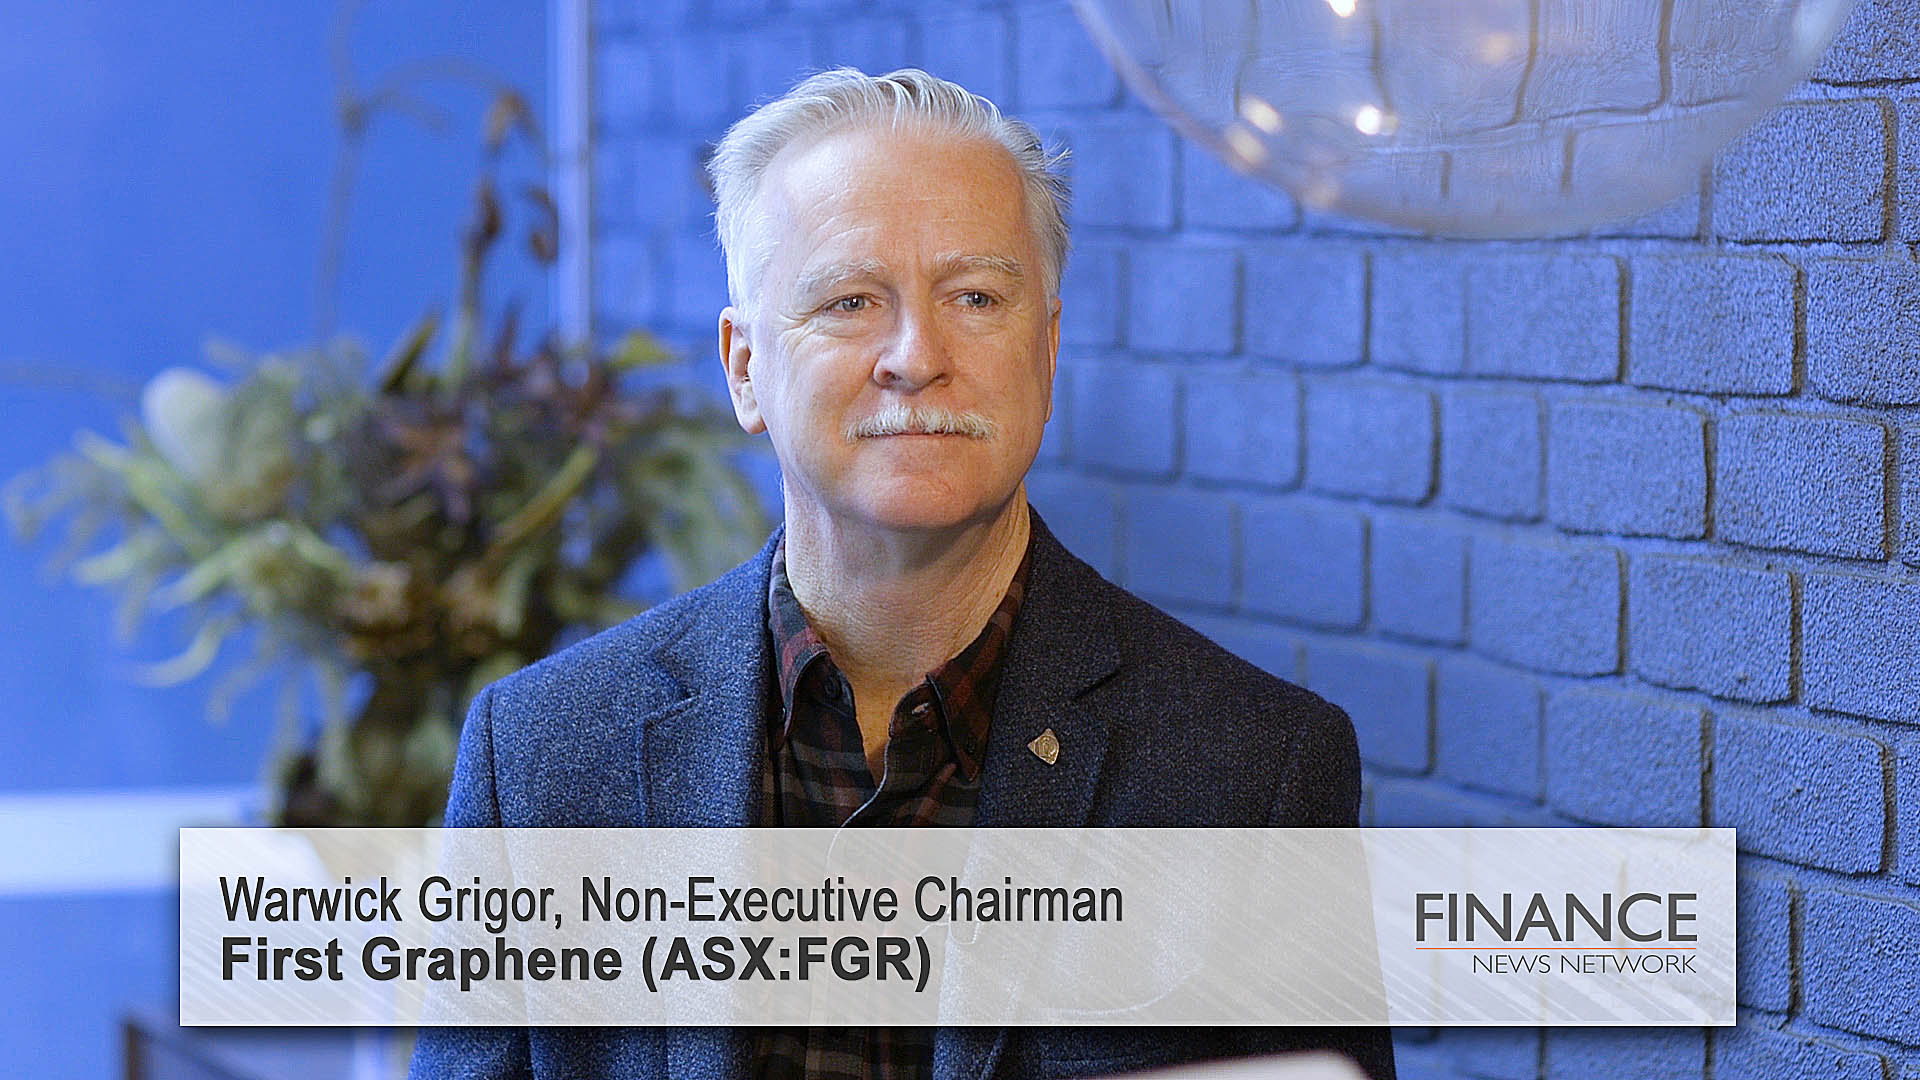 First Graphene (ASX:FGR) completes capital raising